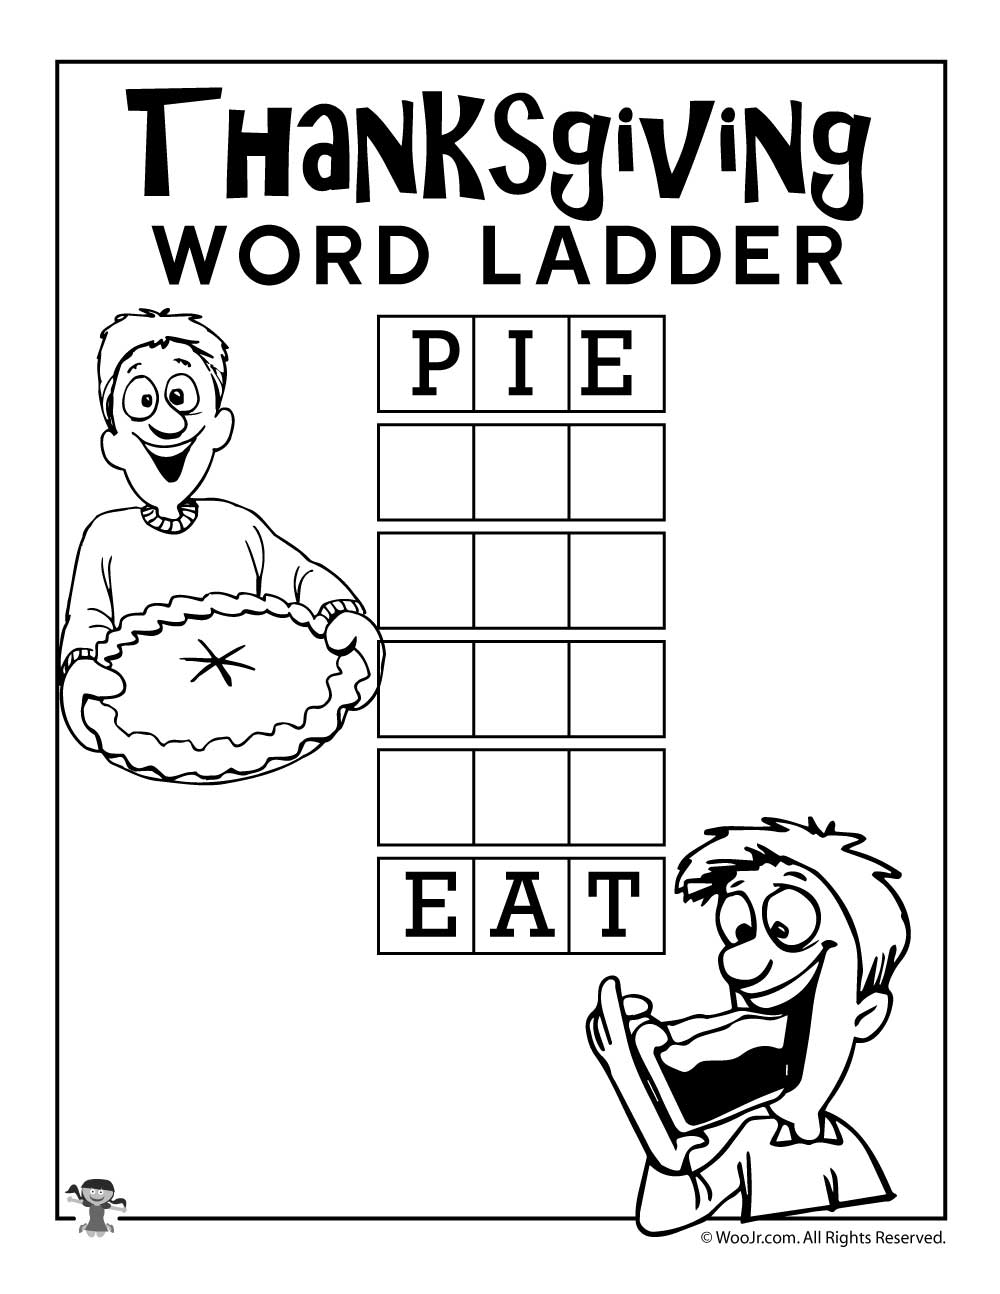 Pie E T W D L Dder Woo Jr Kids Ctivities